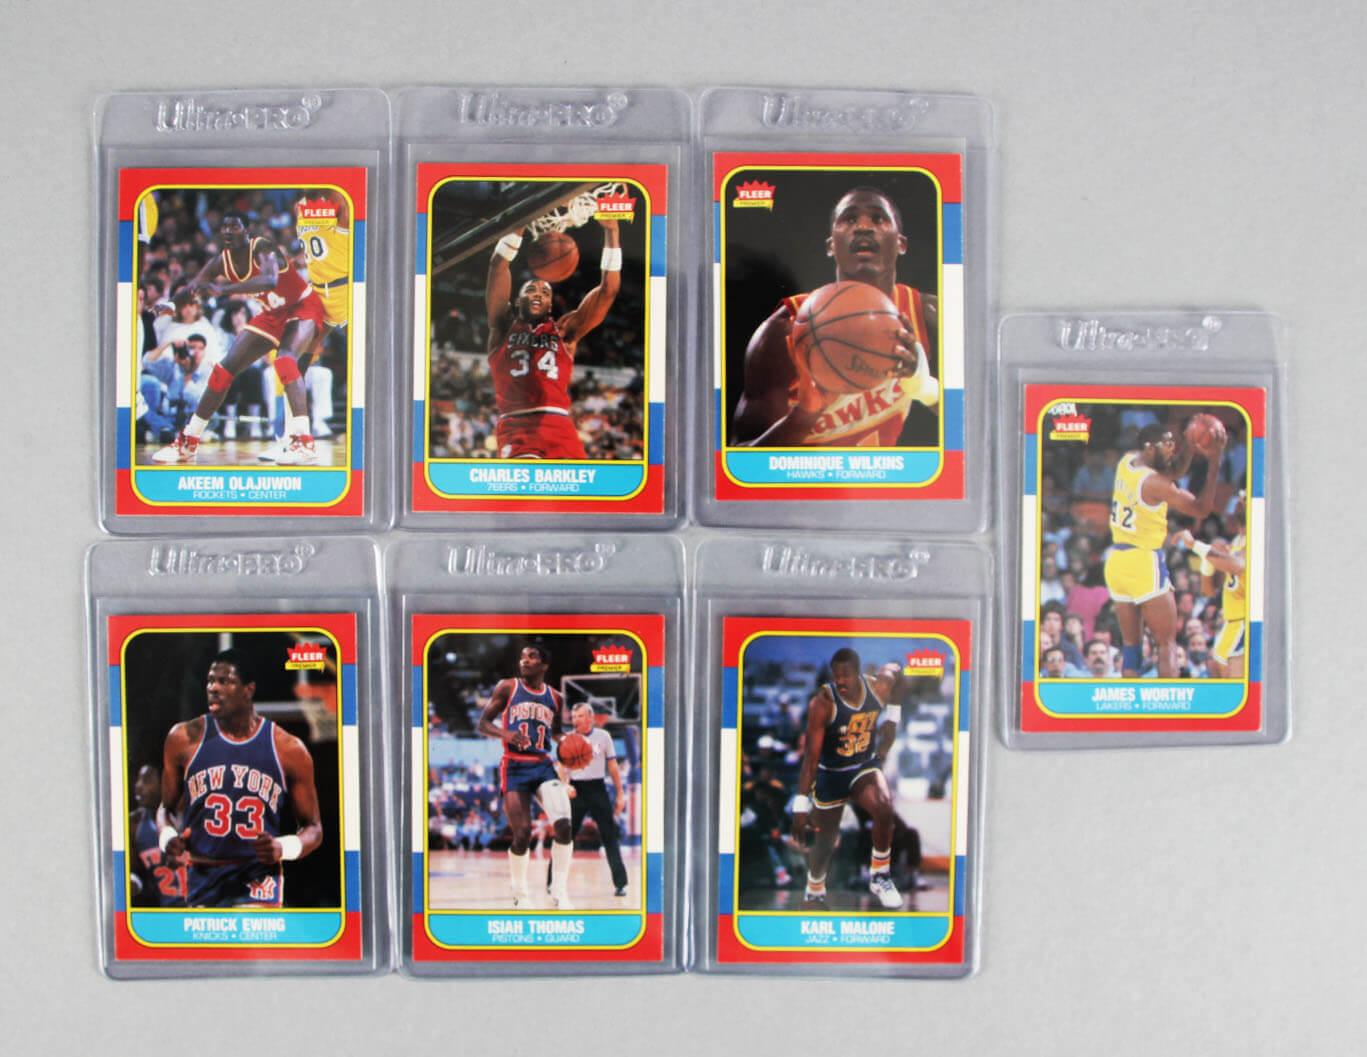 1986-87 Fleer Basketball Card Lot (7) feat. Rookies Barkley, Ewing, Malone, Olajuwon etc.